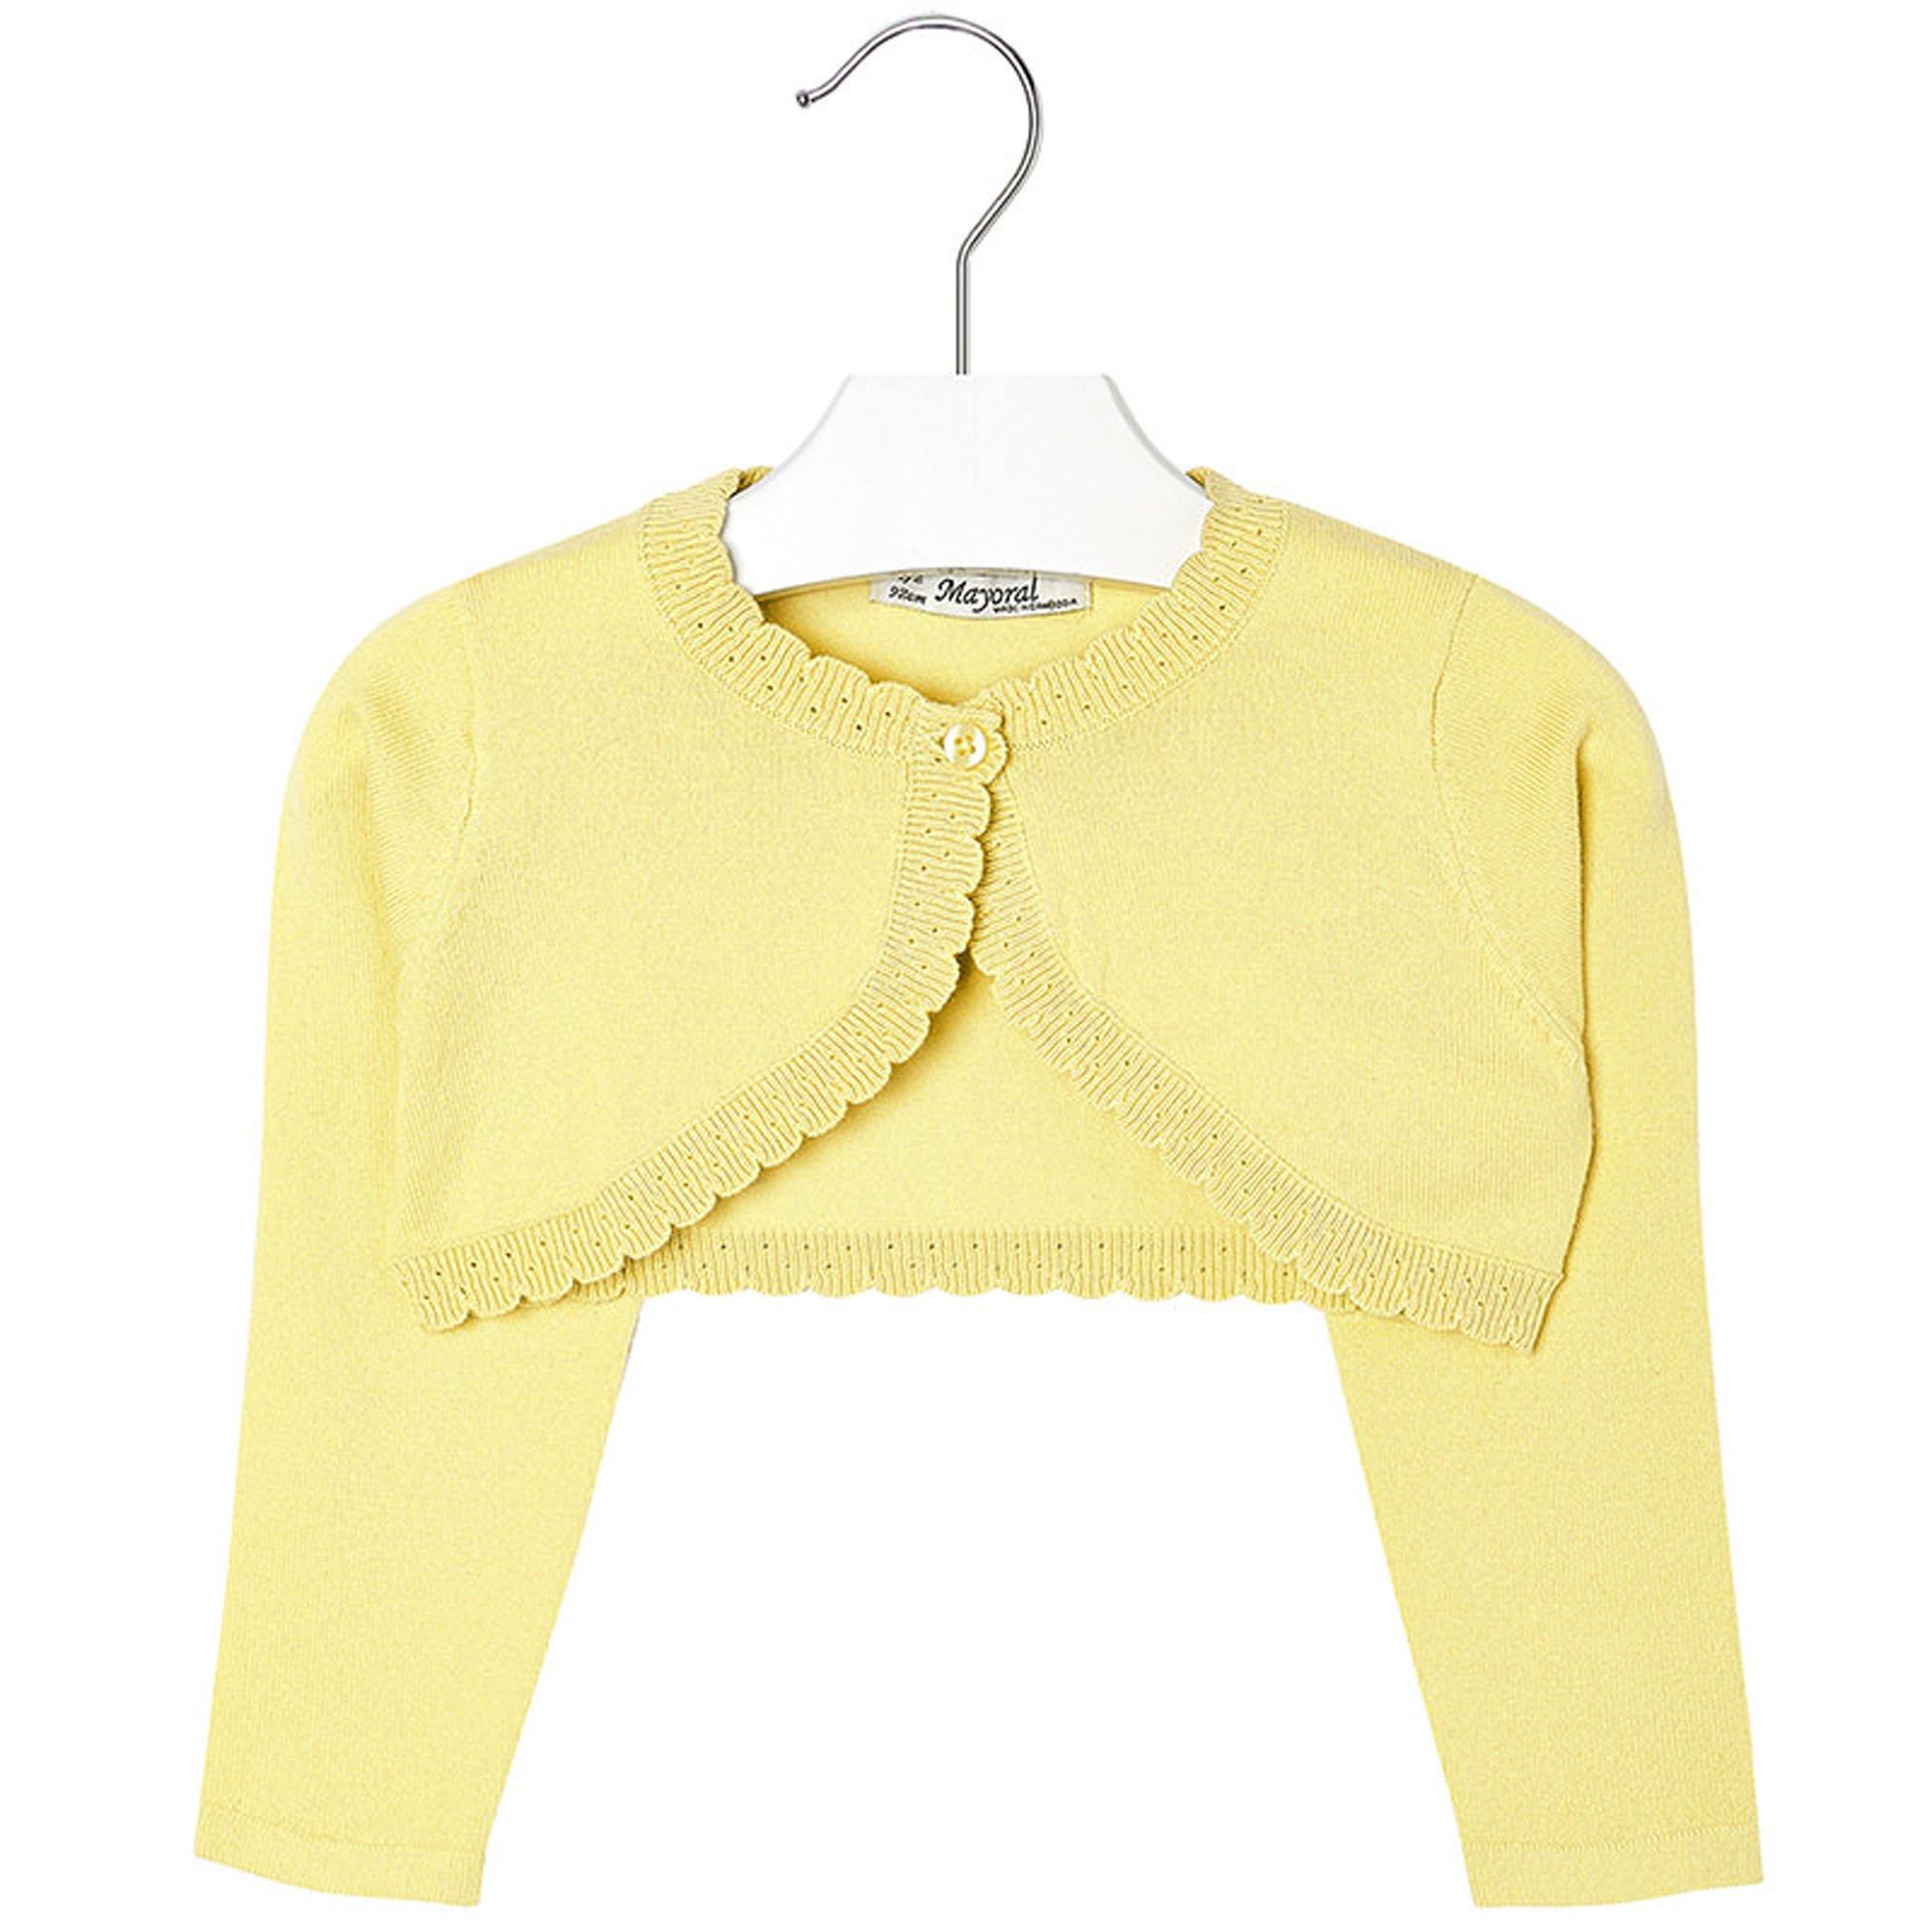 Mayoral Girls 2T-9 Chamomile-Yellow Scallop Edge Knit Shrug Cardigan Sweater, Chamomile,9